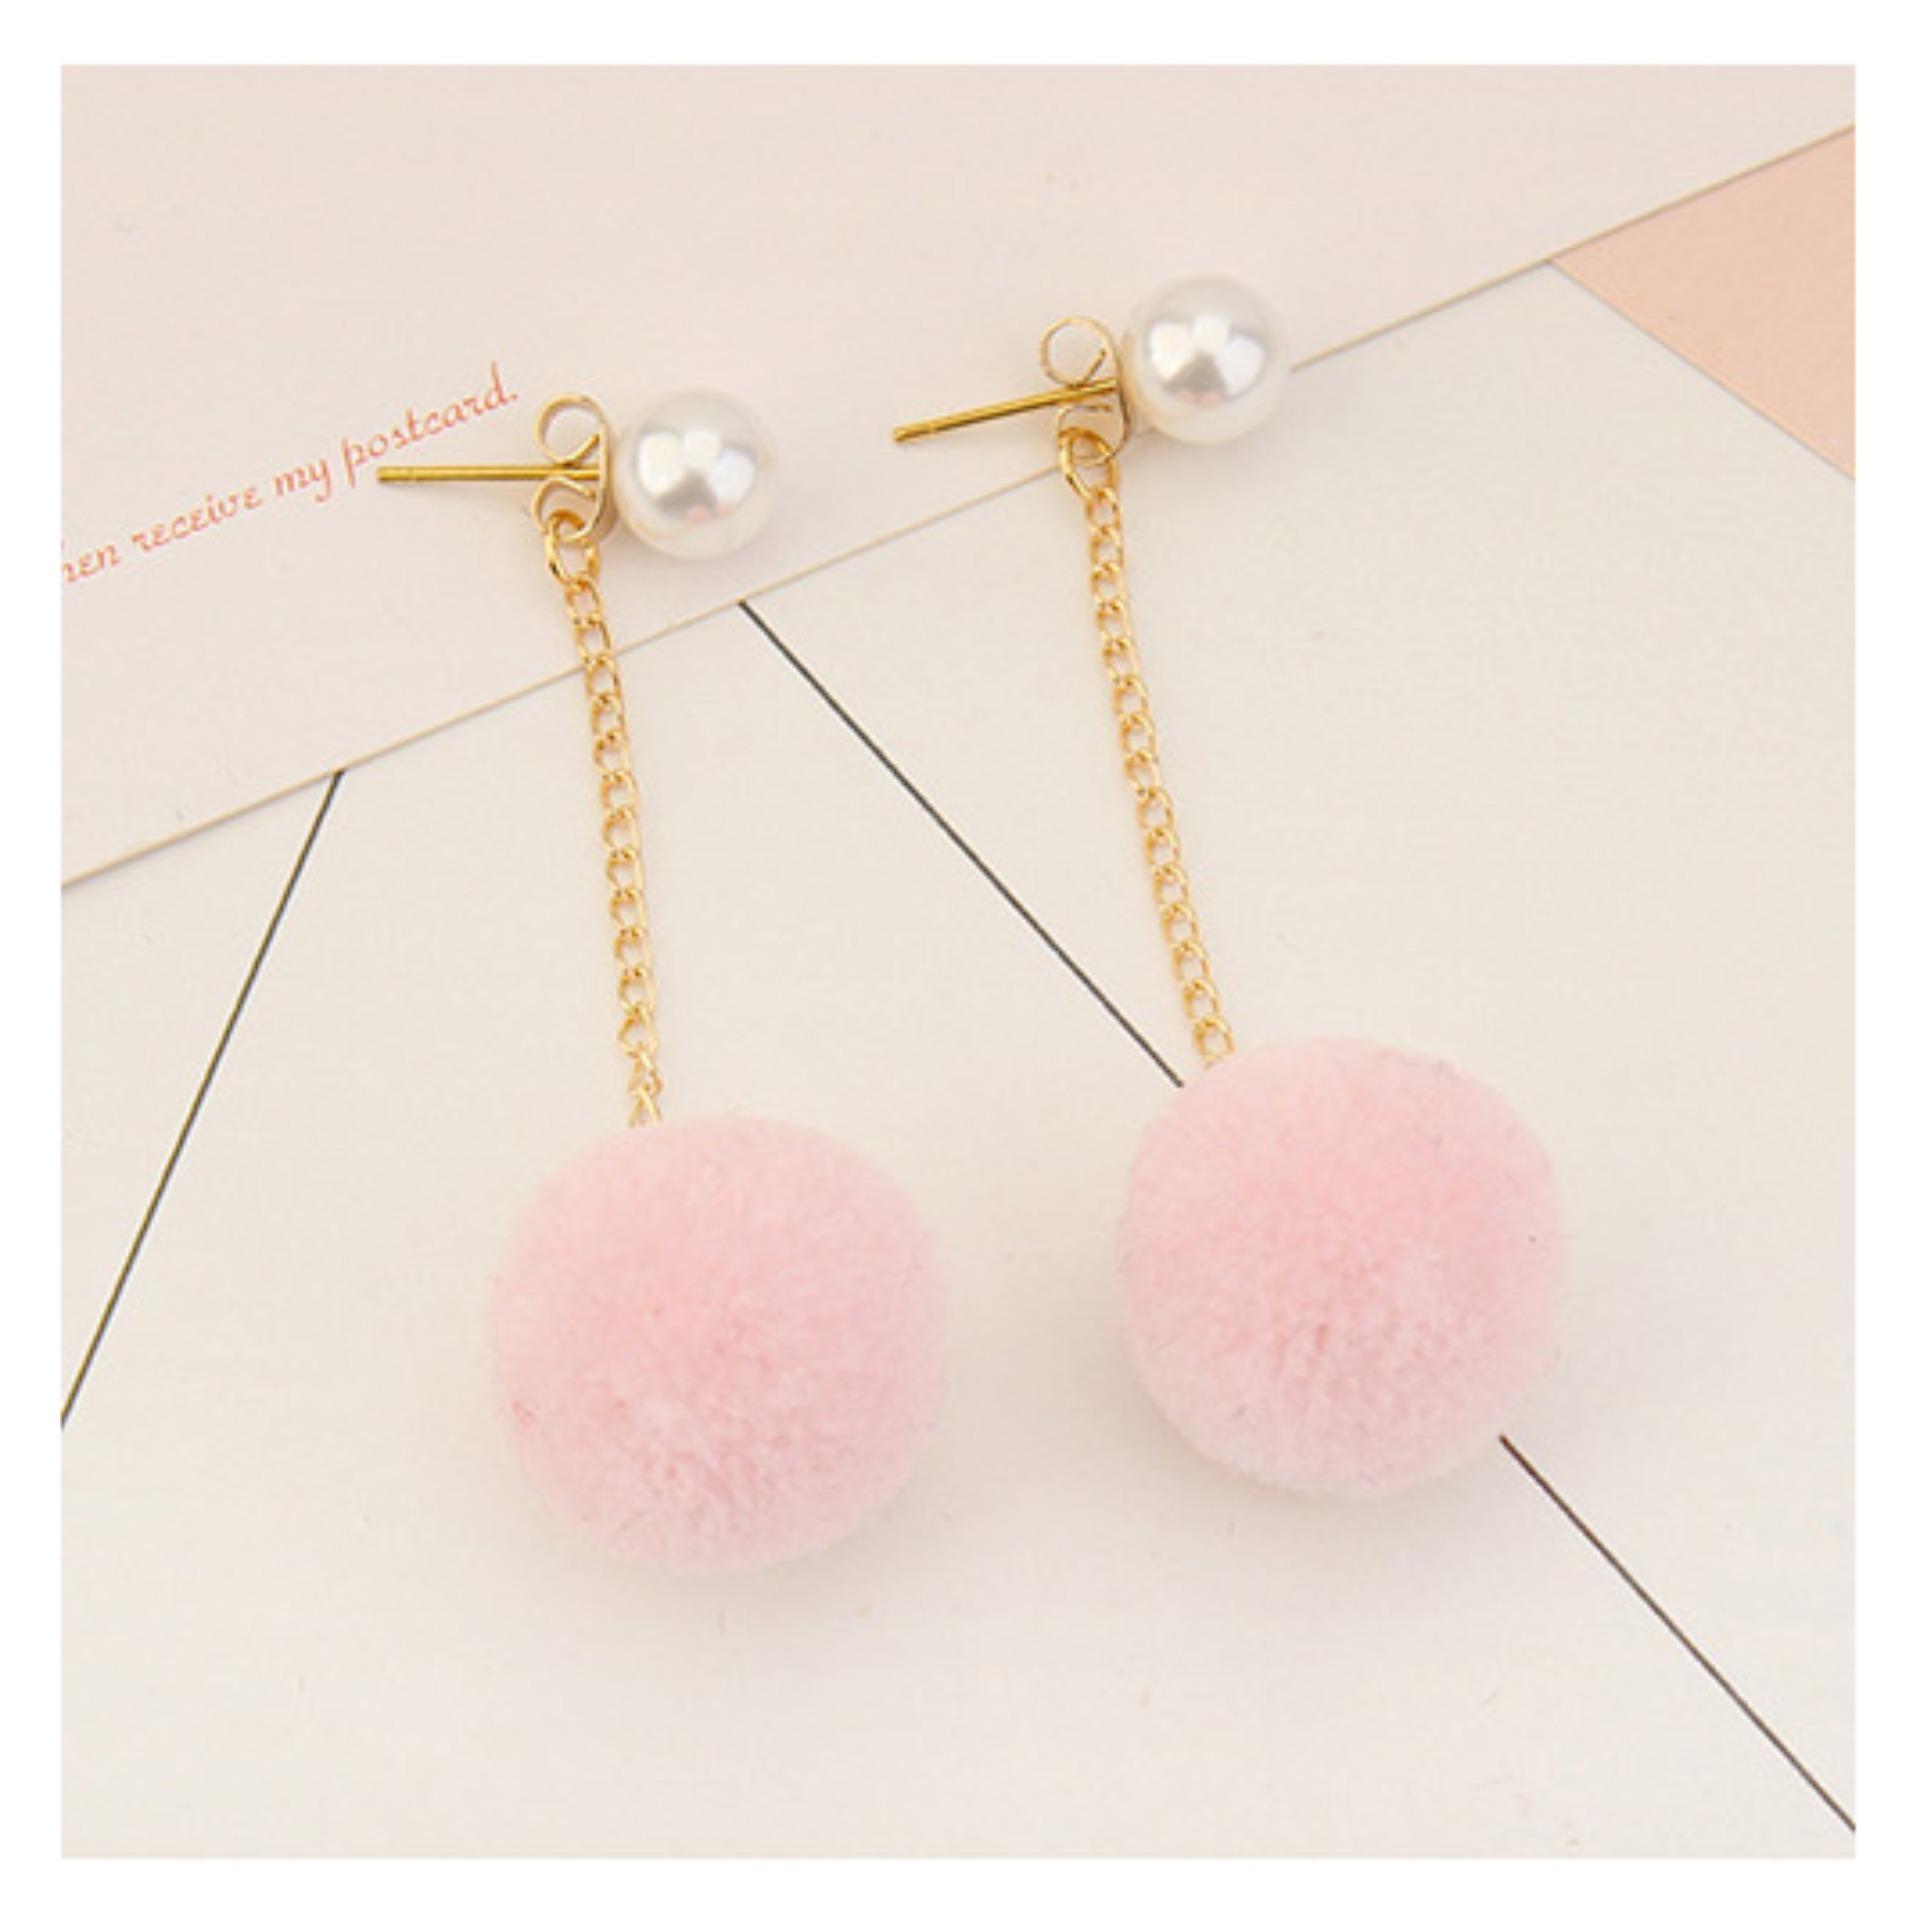 Pencari Harga LRC Anting Tusuk Sweet Fuzzy Ball&pearls Decorated Pom Earrings terbaik murah - Hanya Rp9